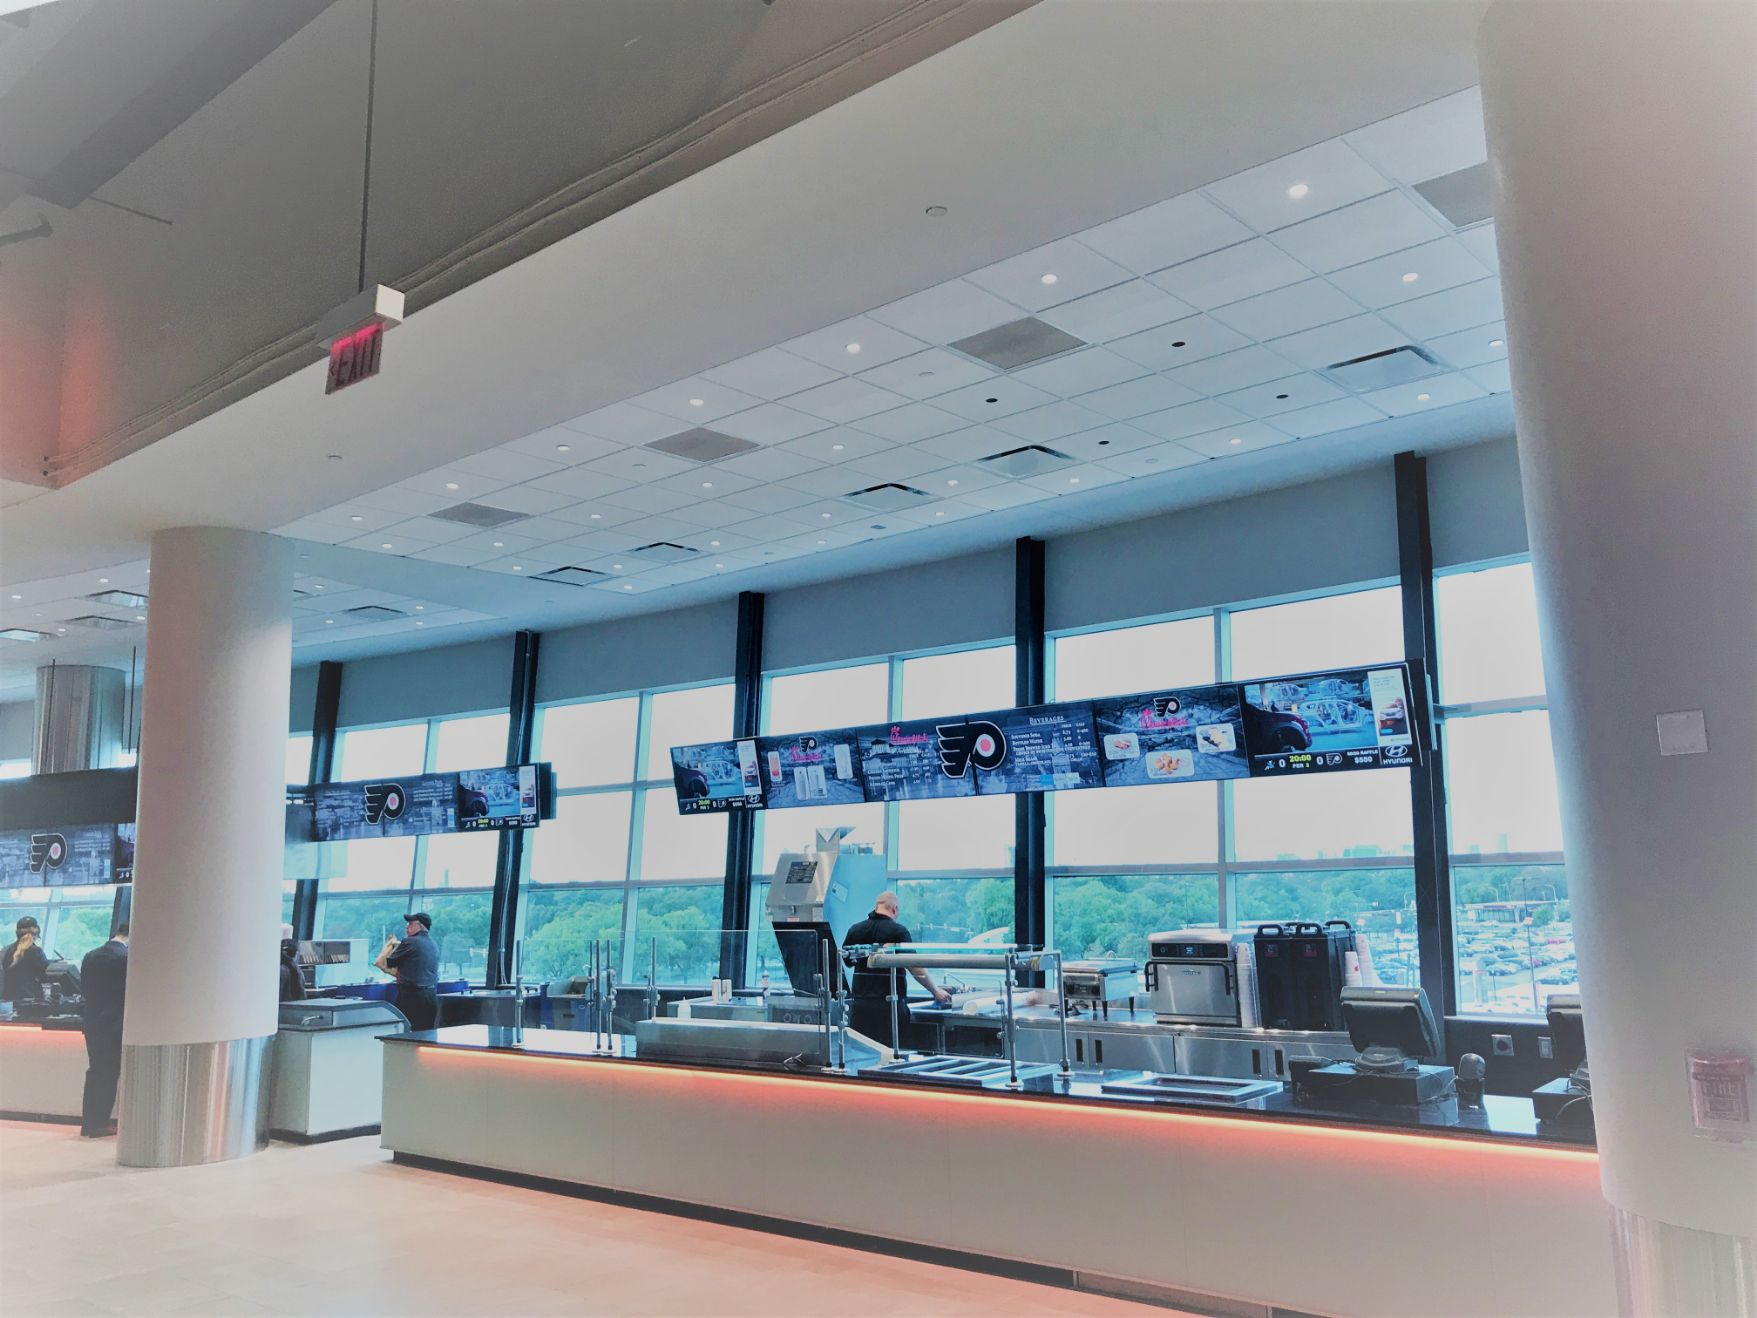 Wells Fargo Center IPTV